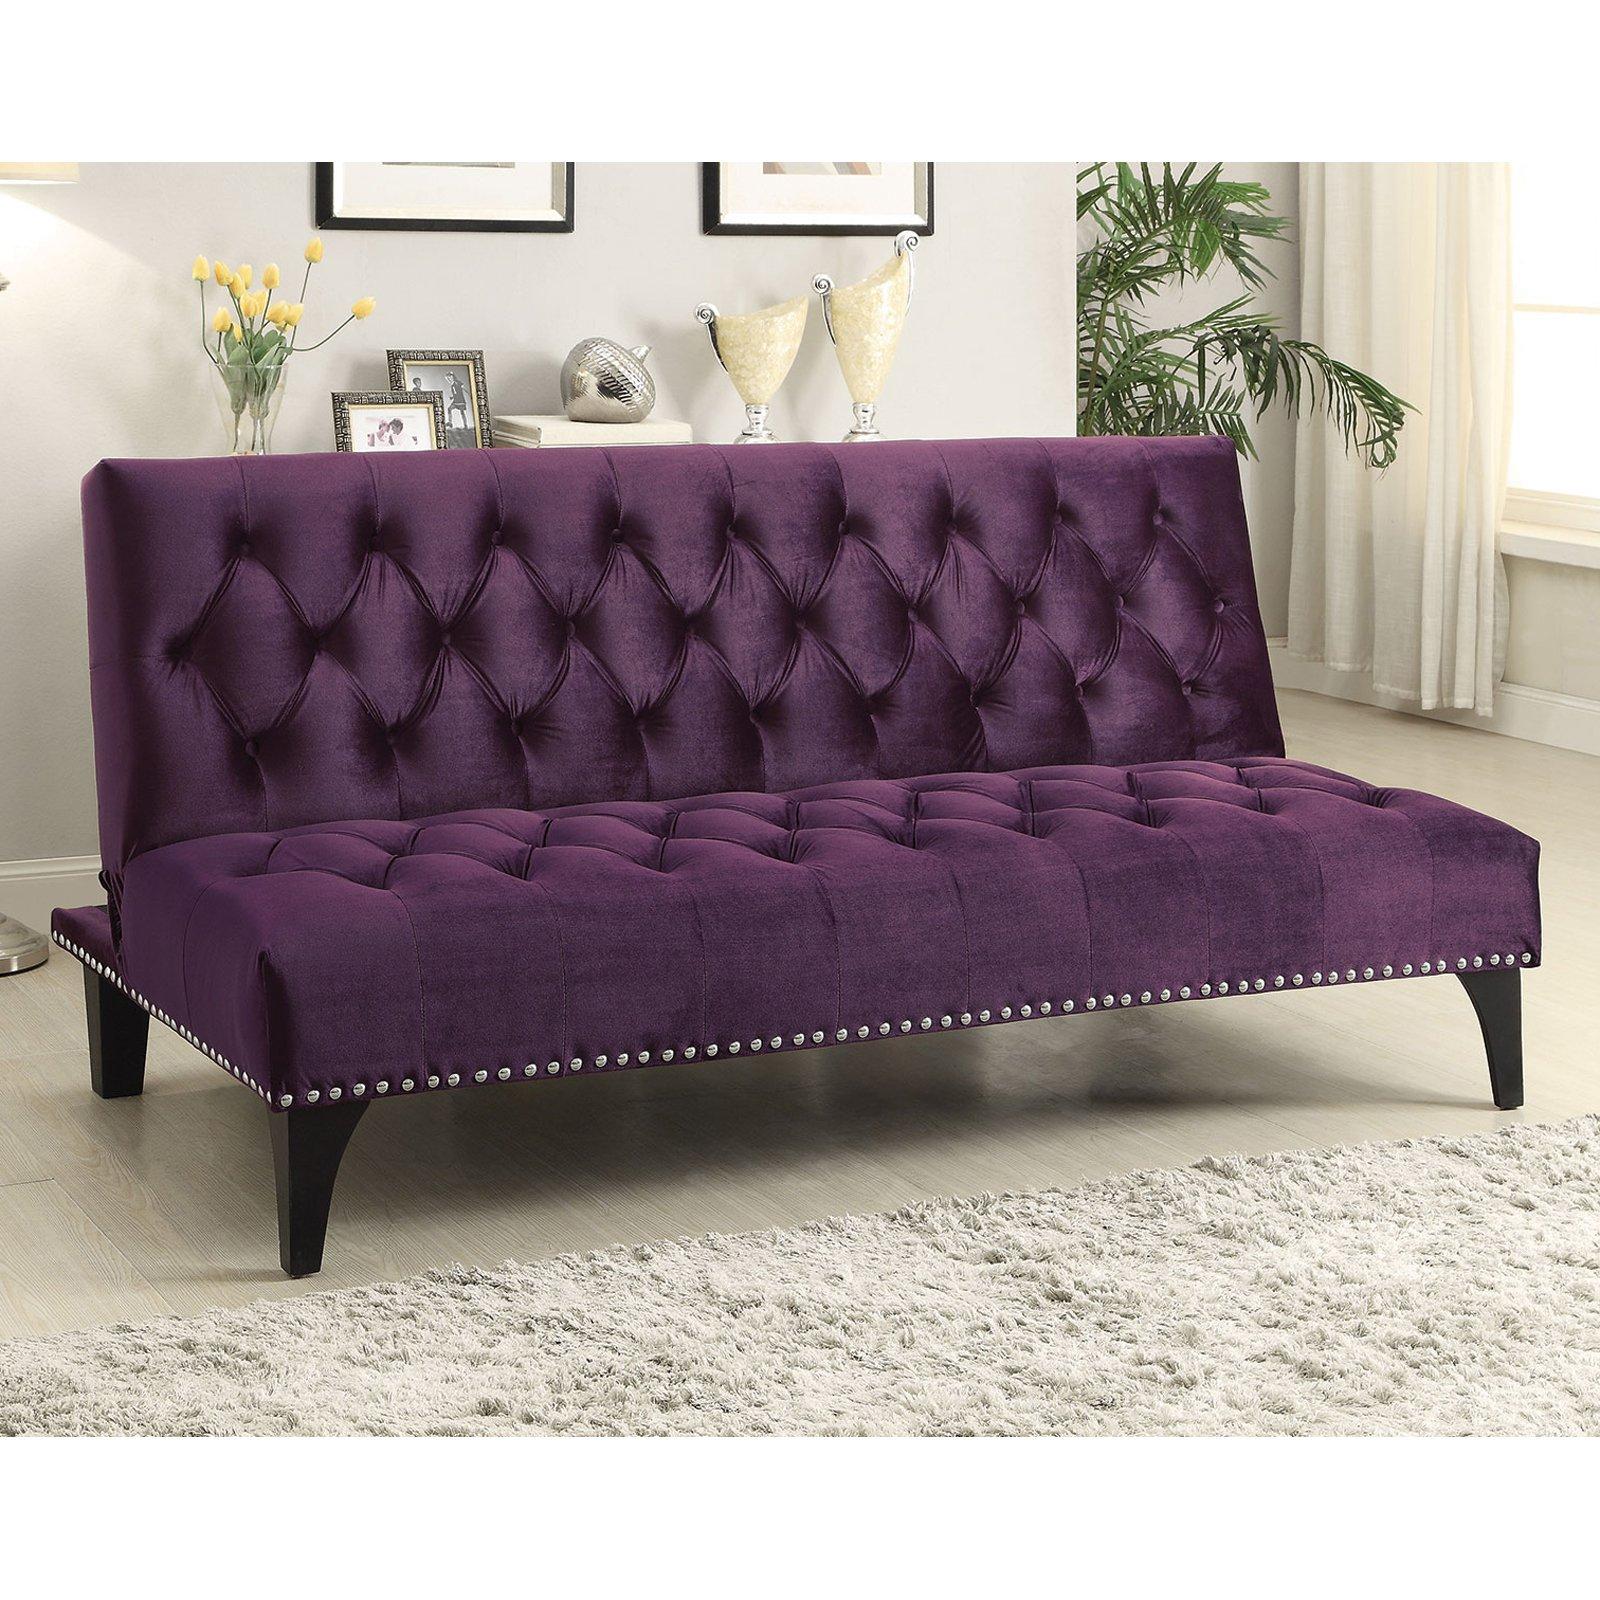 Coaster Company Velvet Sofa Bed, Multiple Colors